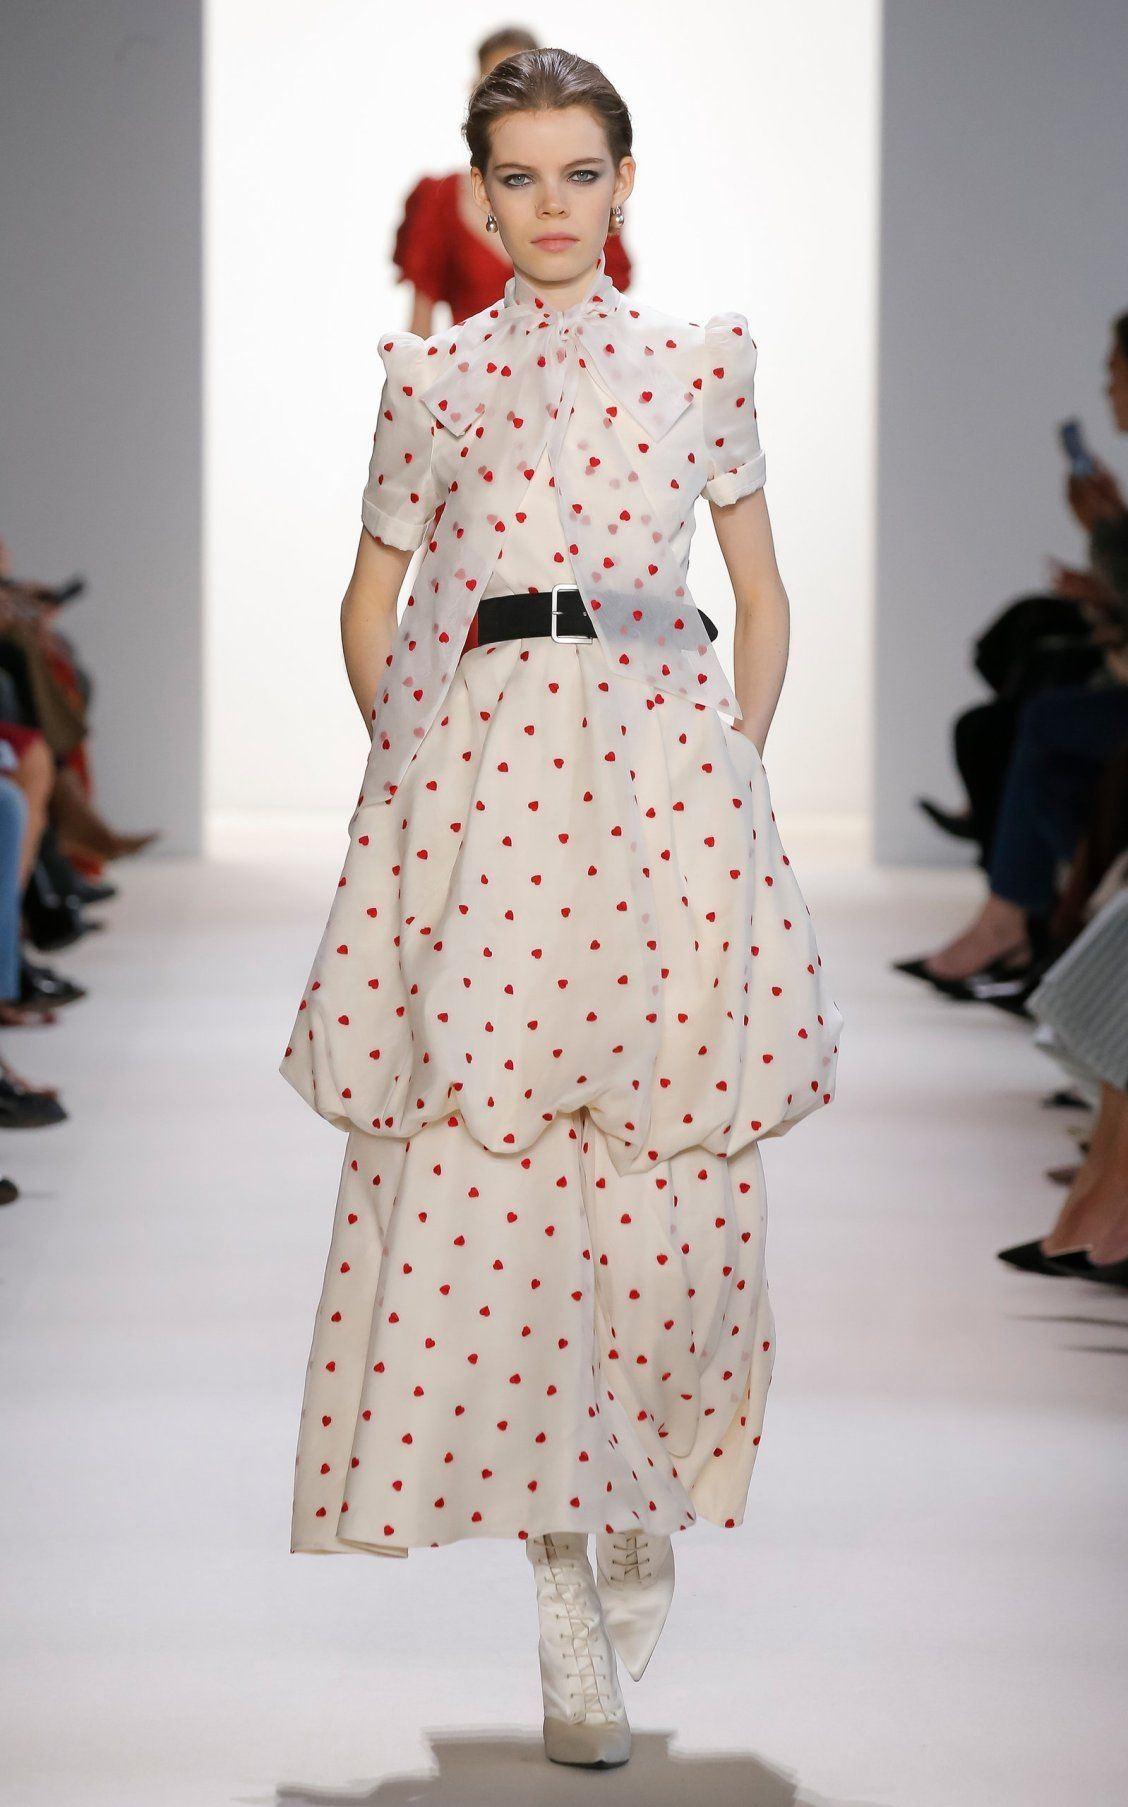 Fashion Designer Runway Summer Women Dress Short Flare Sleeve Floral Print Heart O Collar Indie Folk